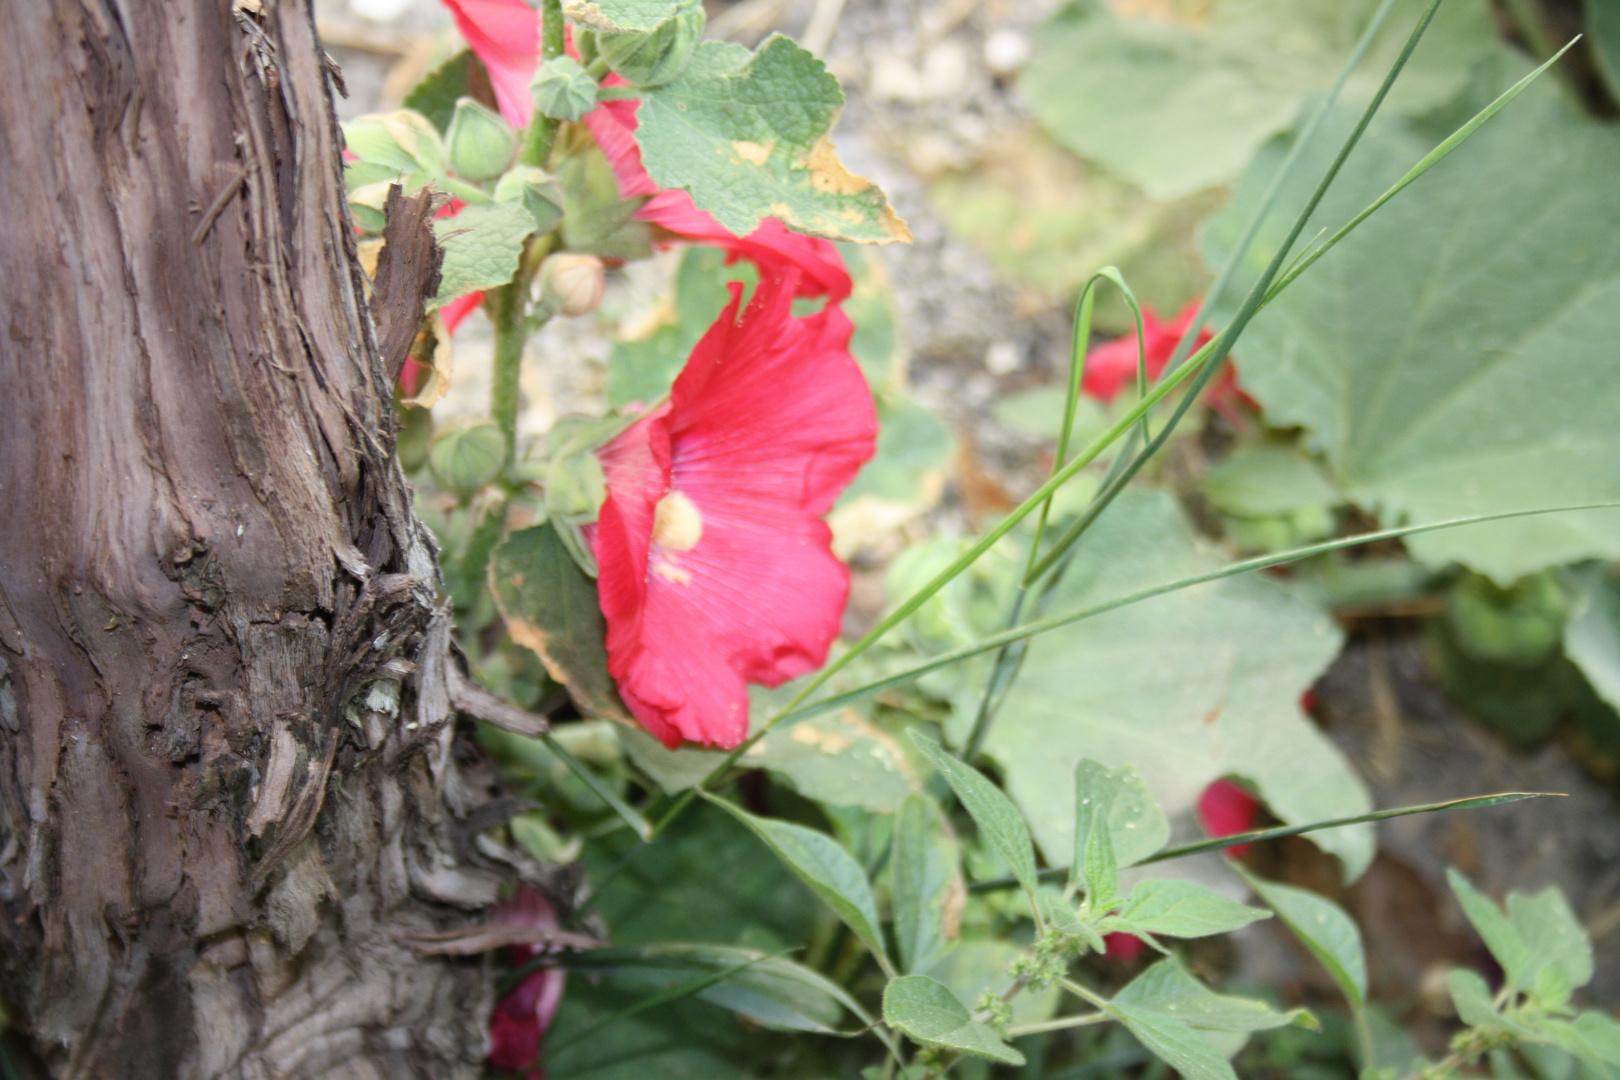 pied de vigne fleuris